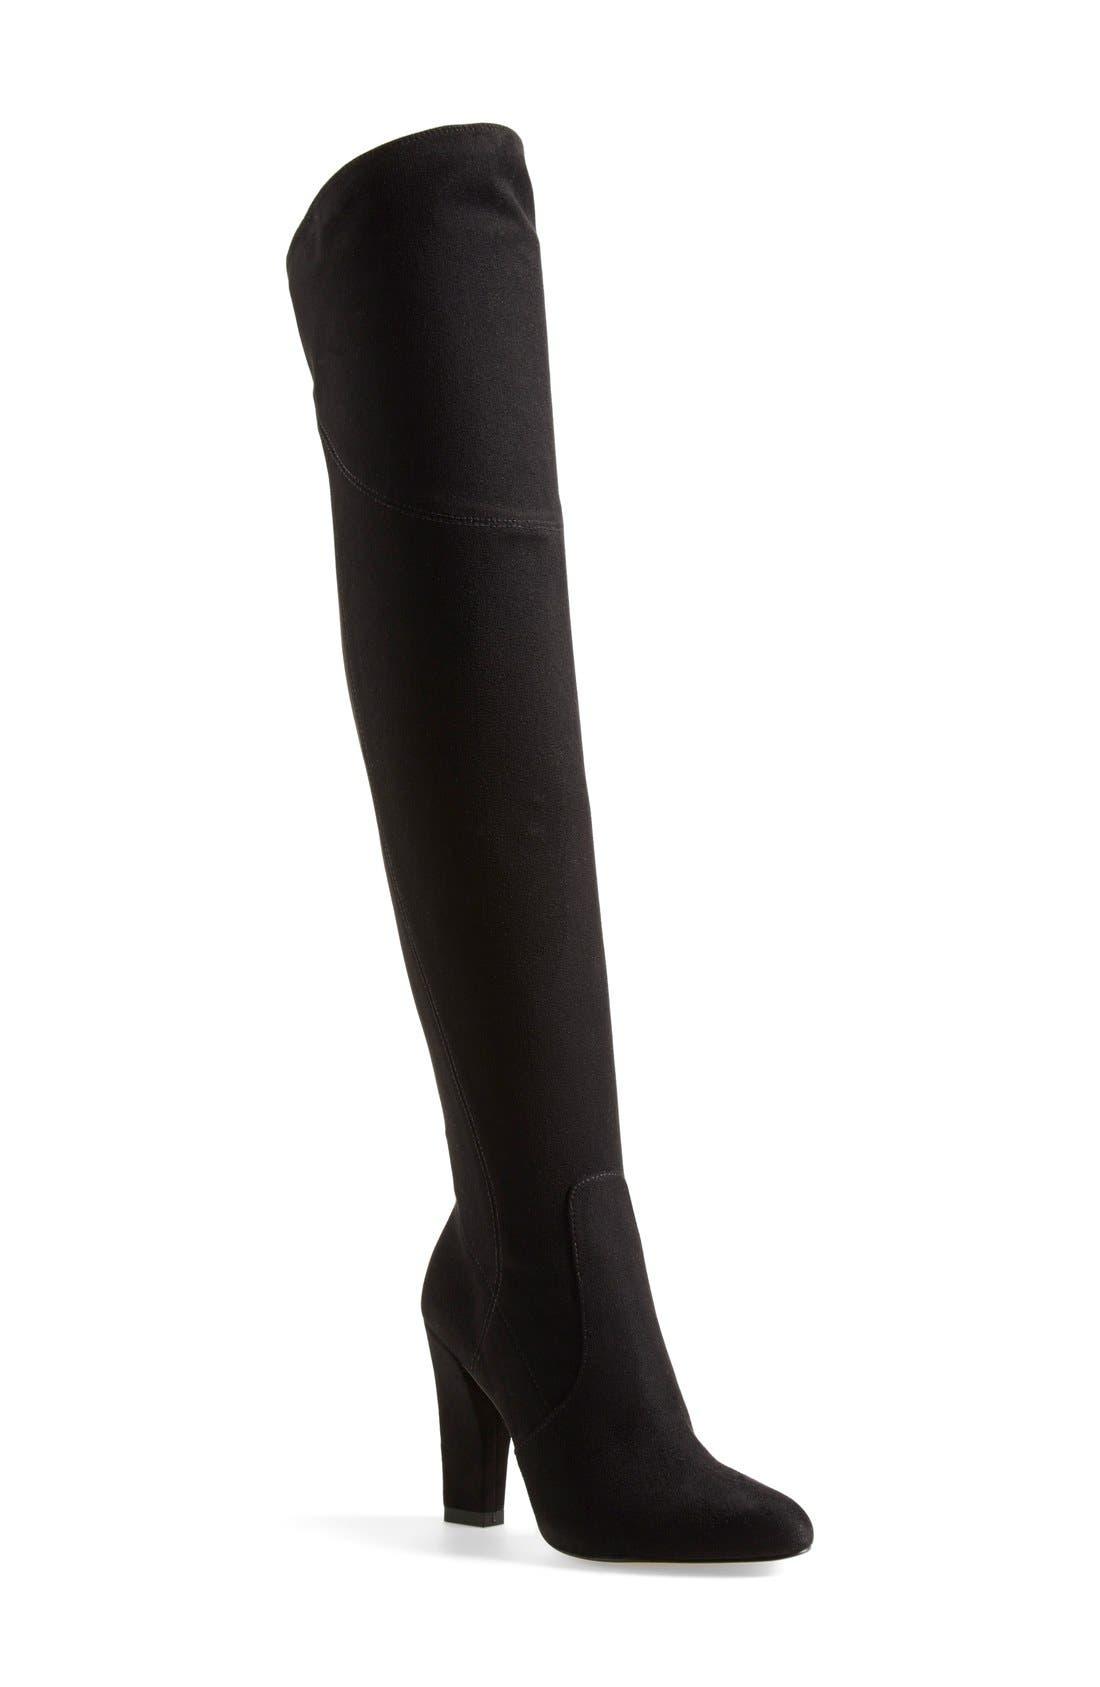 Alternate Image 1 Selected - IvankaTrump 'Saffri' Over the Knee Suede Boot (Women)